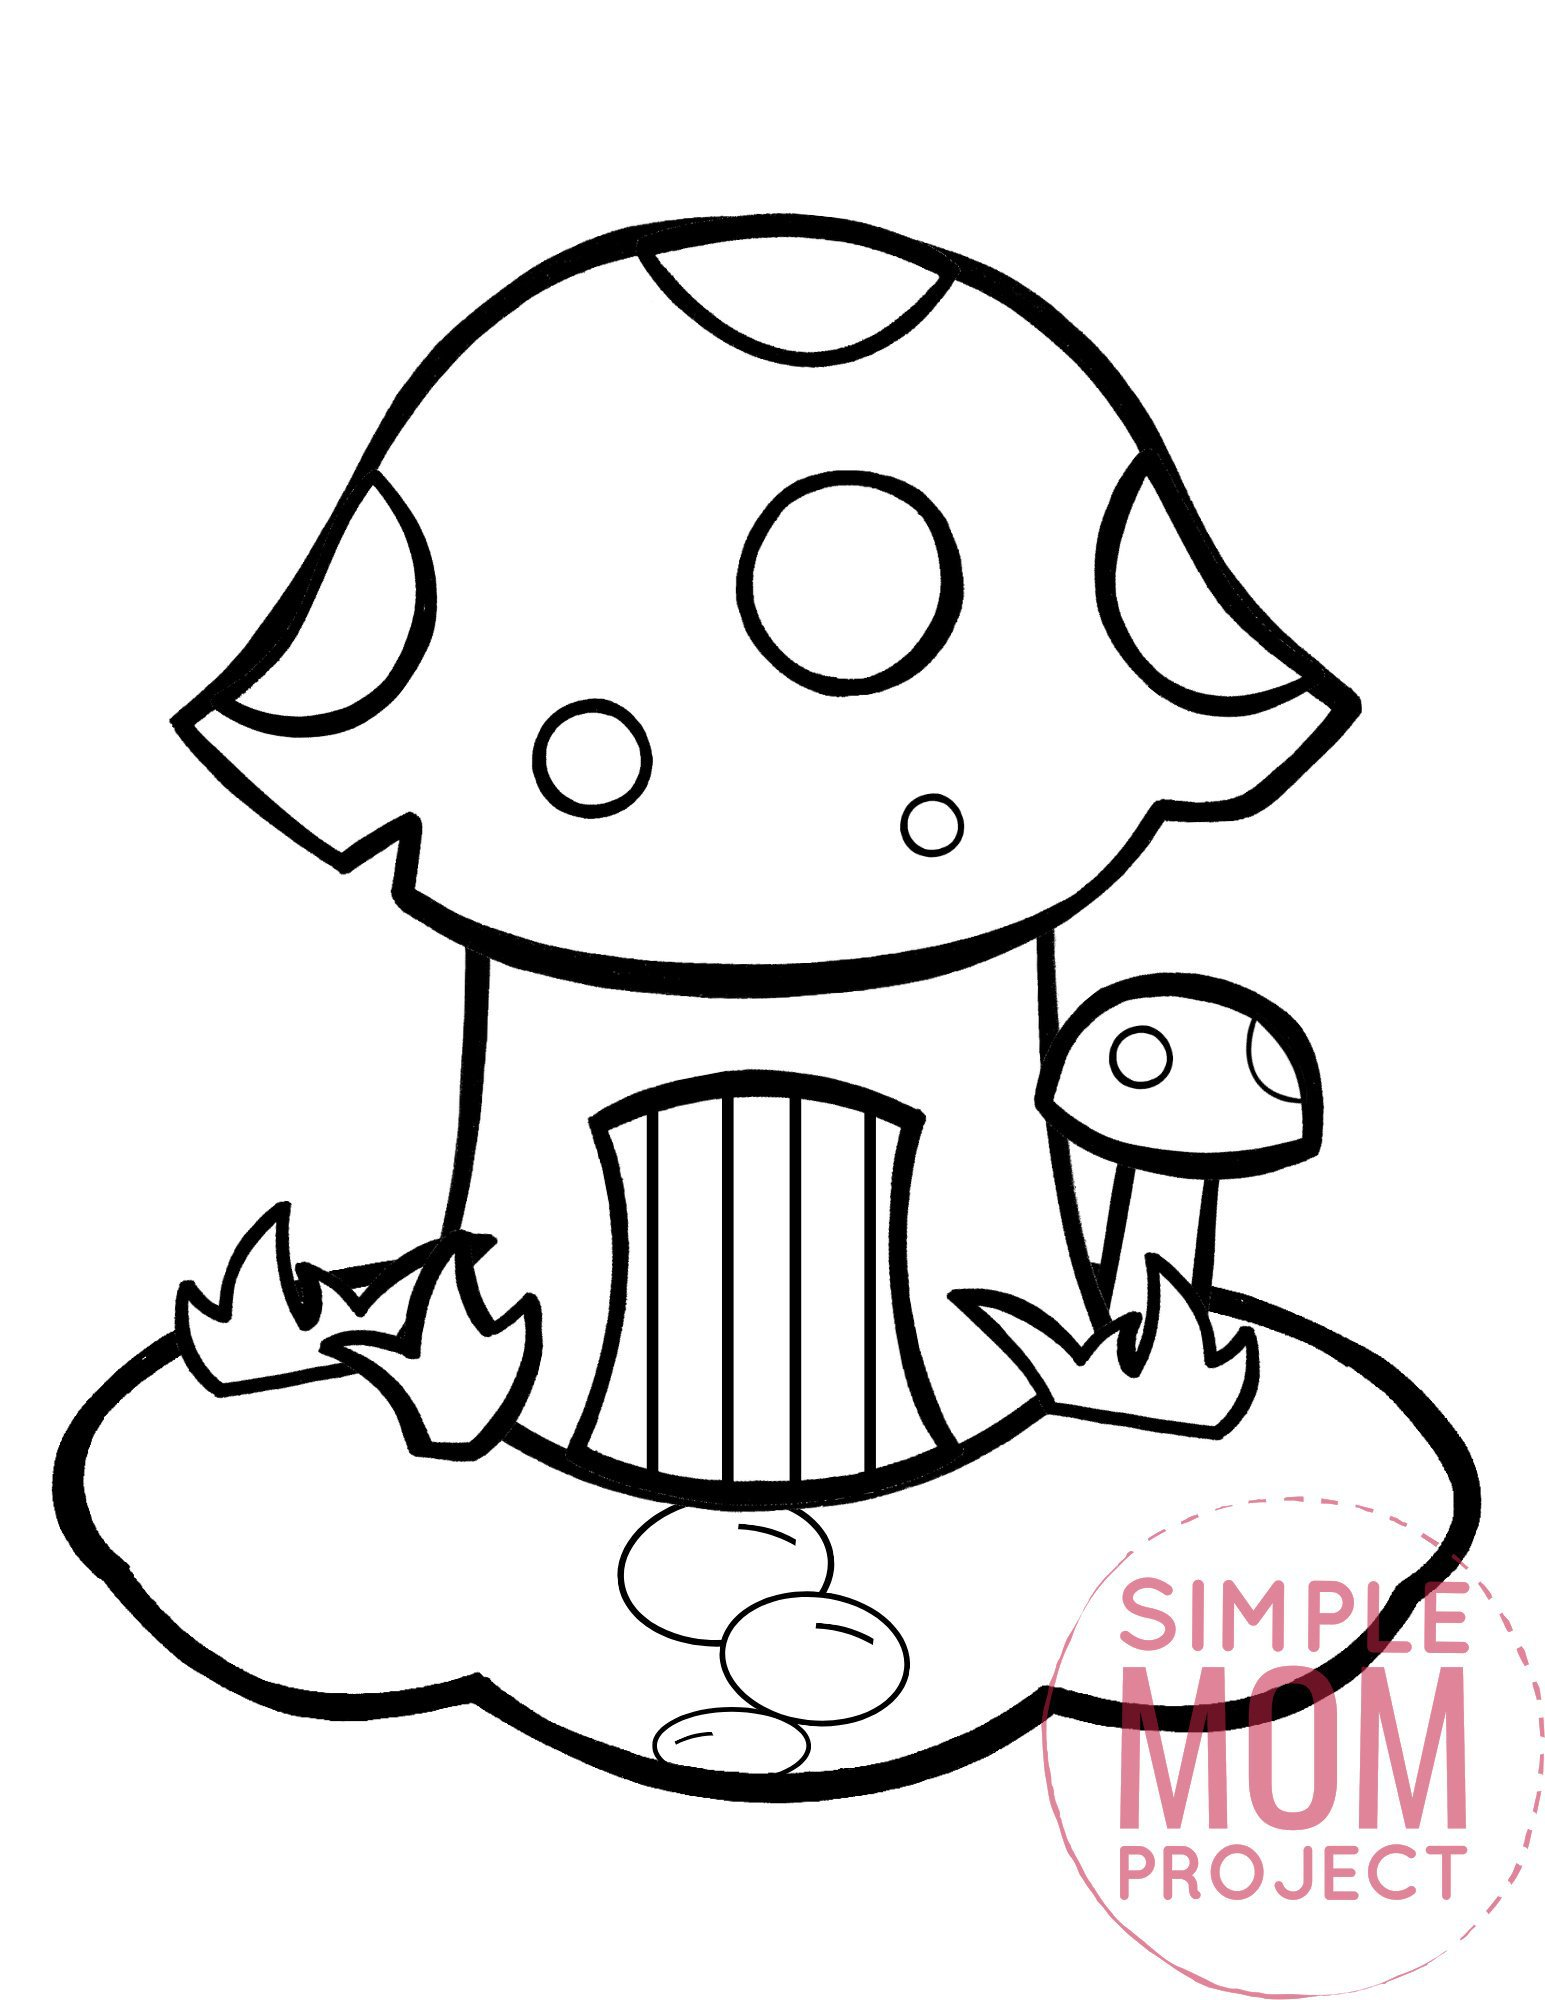 printable mushroom coloring page template for kids, preschoolers and kindergartners